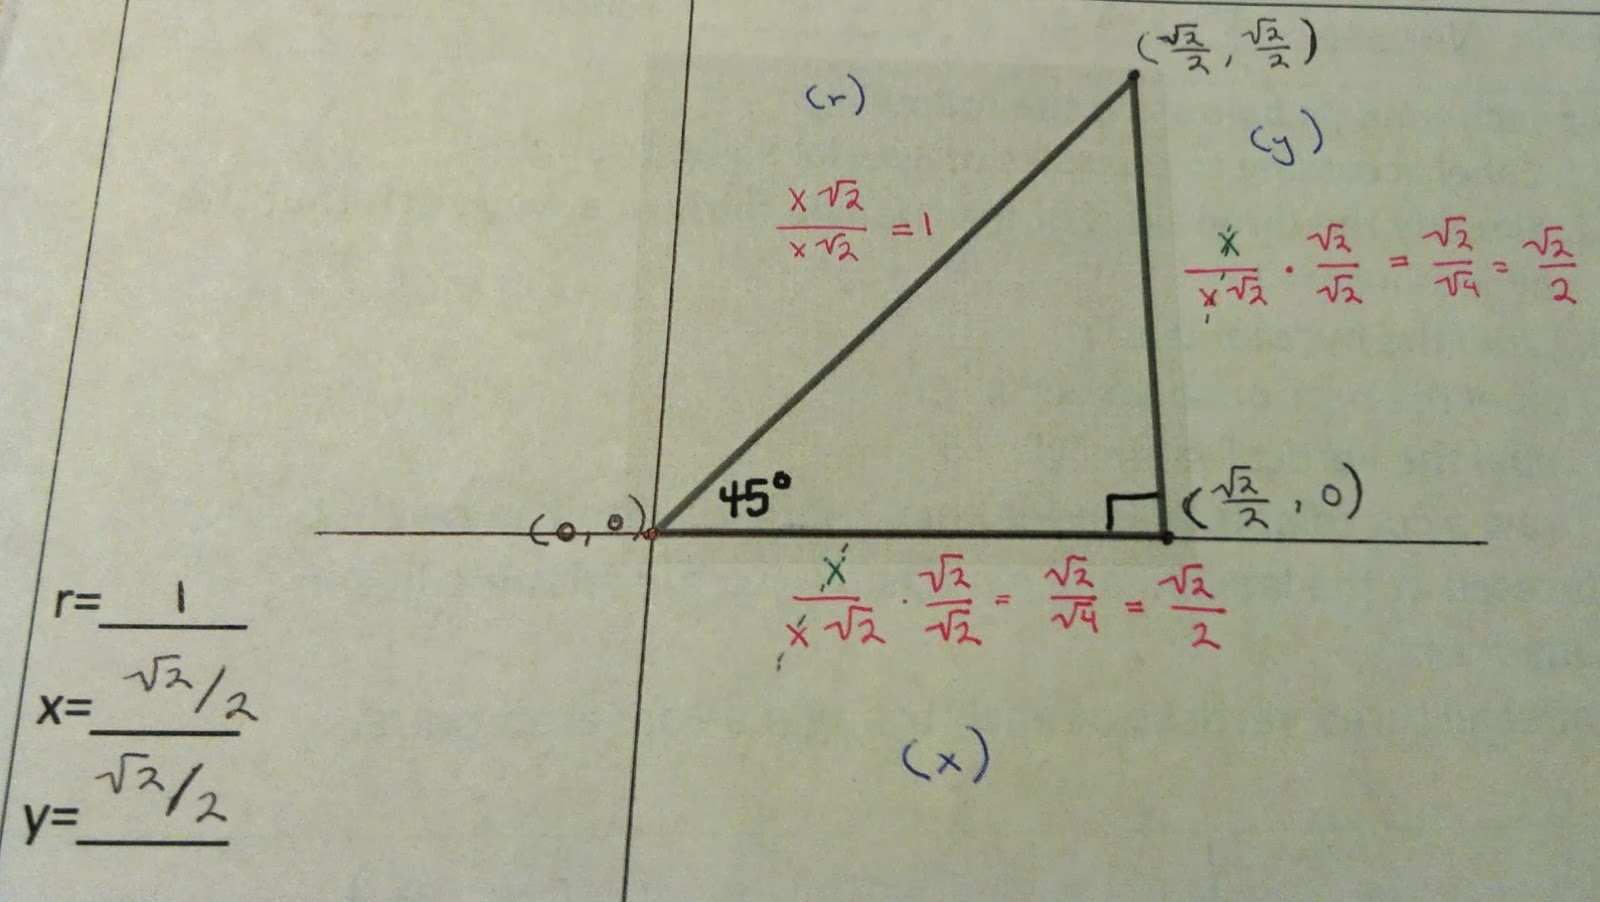 Blank Unit Circle Quadrant I I used to hate math but then i realized ...